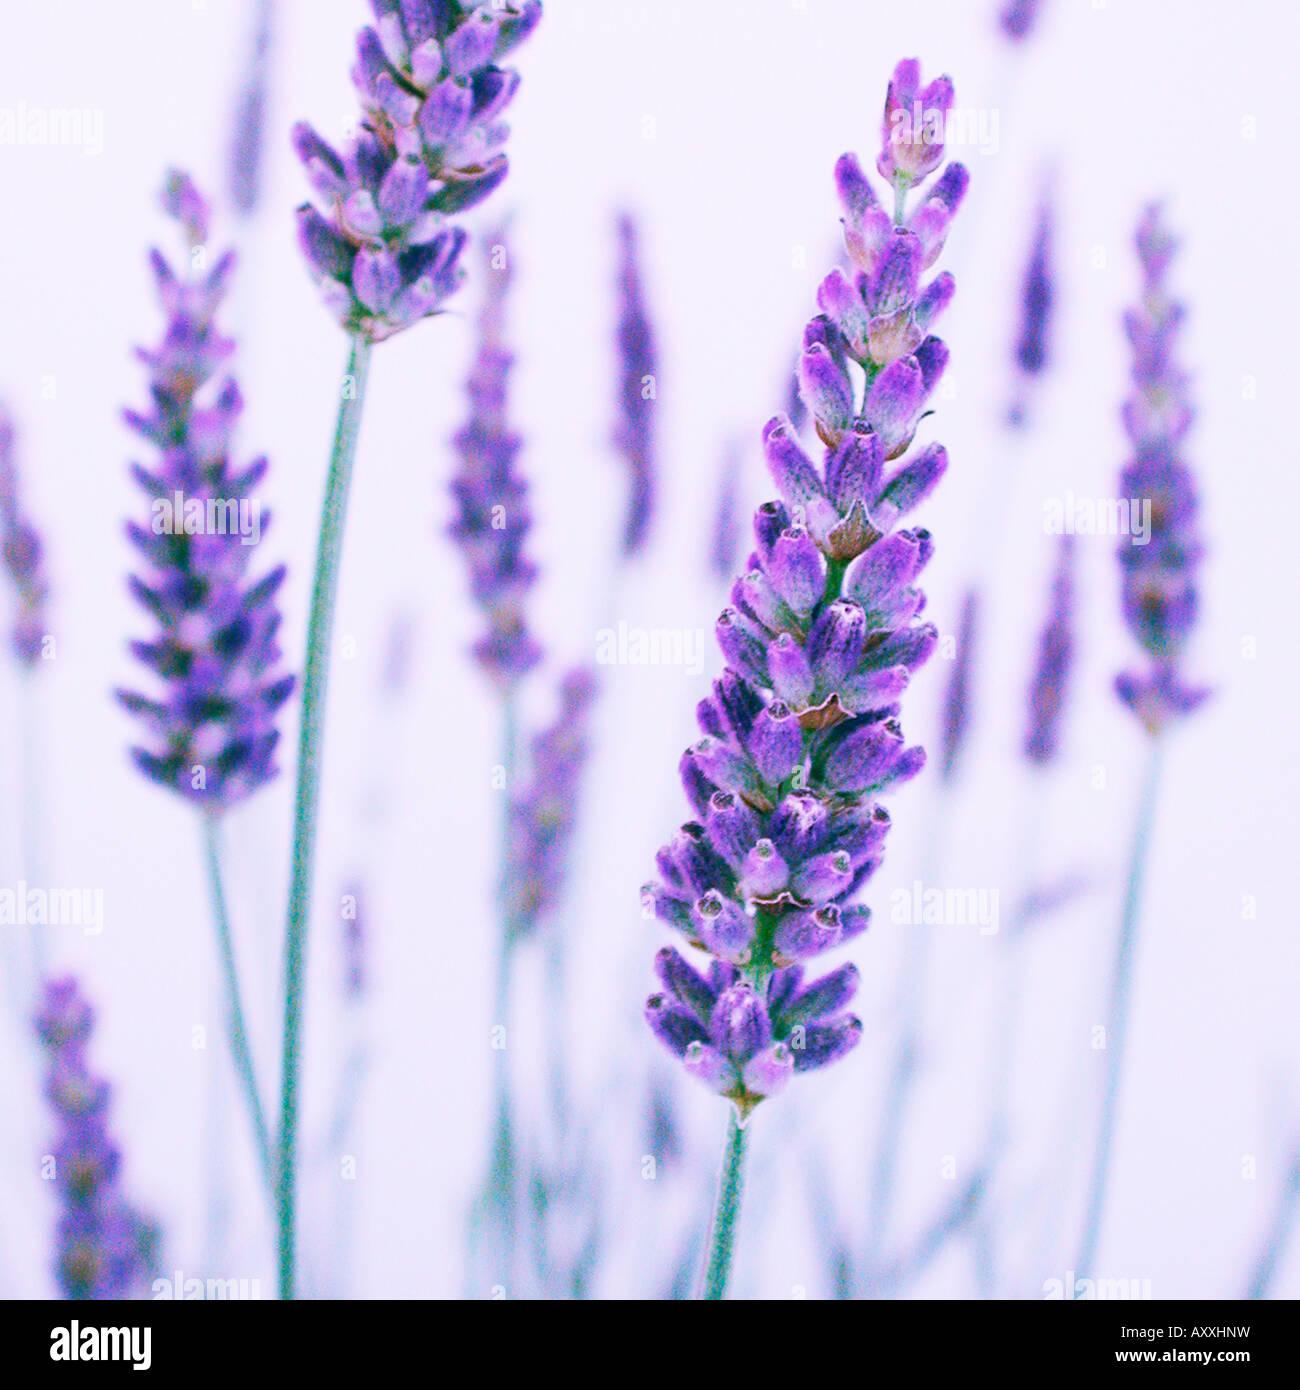 Lavanda, Lavandula, fiori viola su steli. Immagini Stock